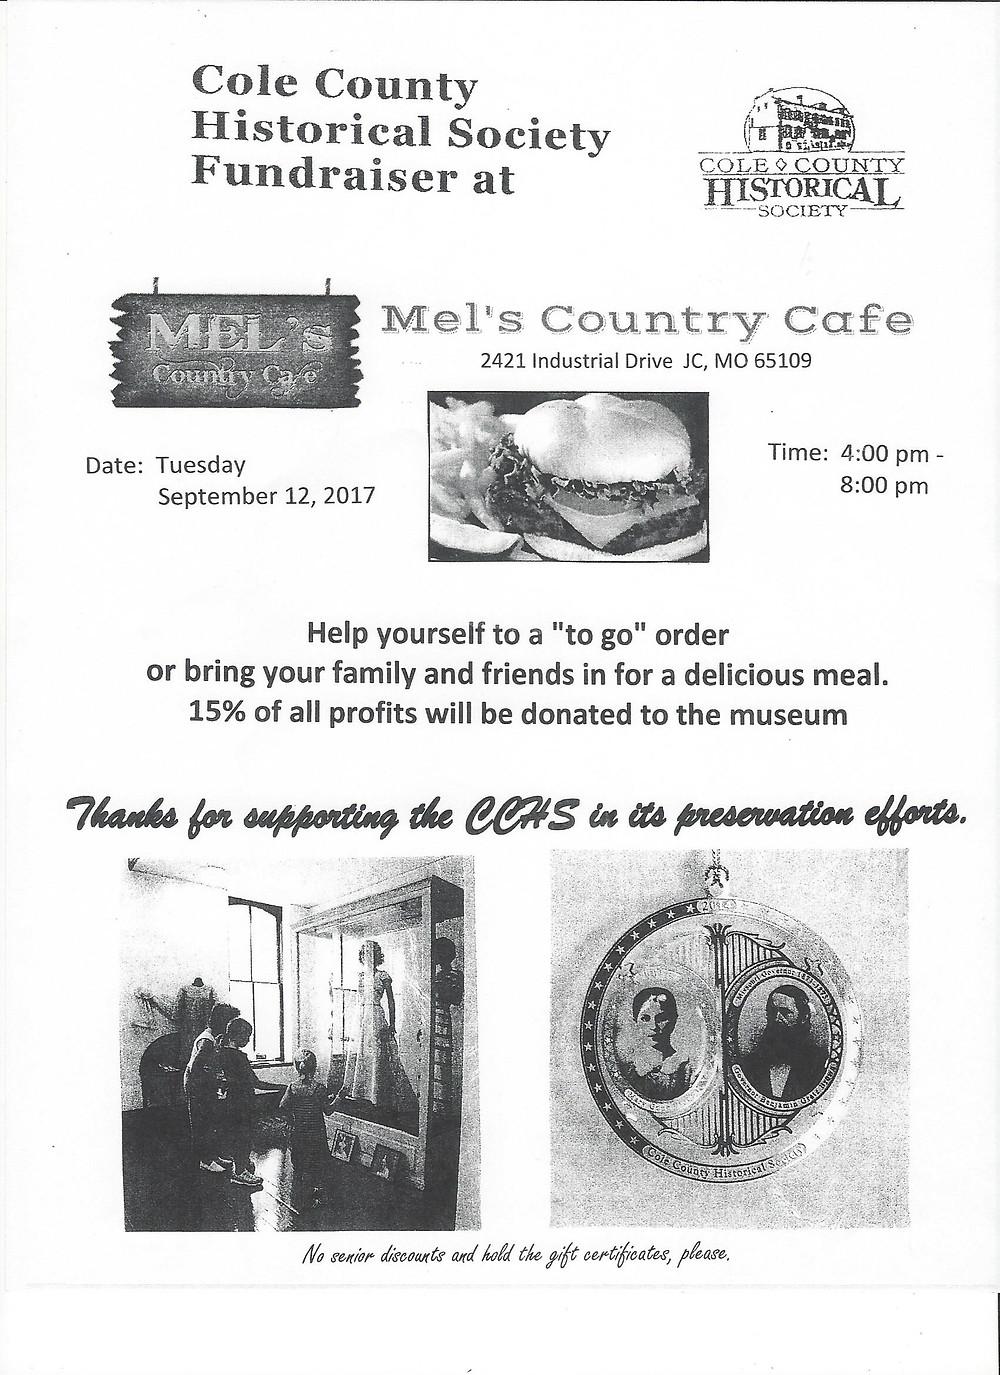 Eat at Mel's 9/12/2017 4 p.m. - 8 p.m.  Fundraiser for CCHS & Museum